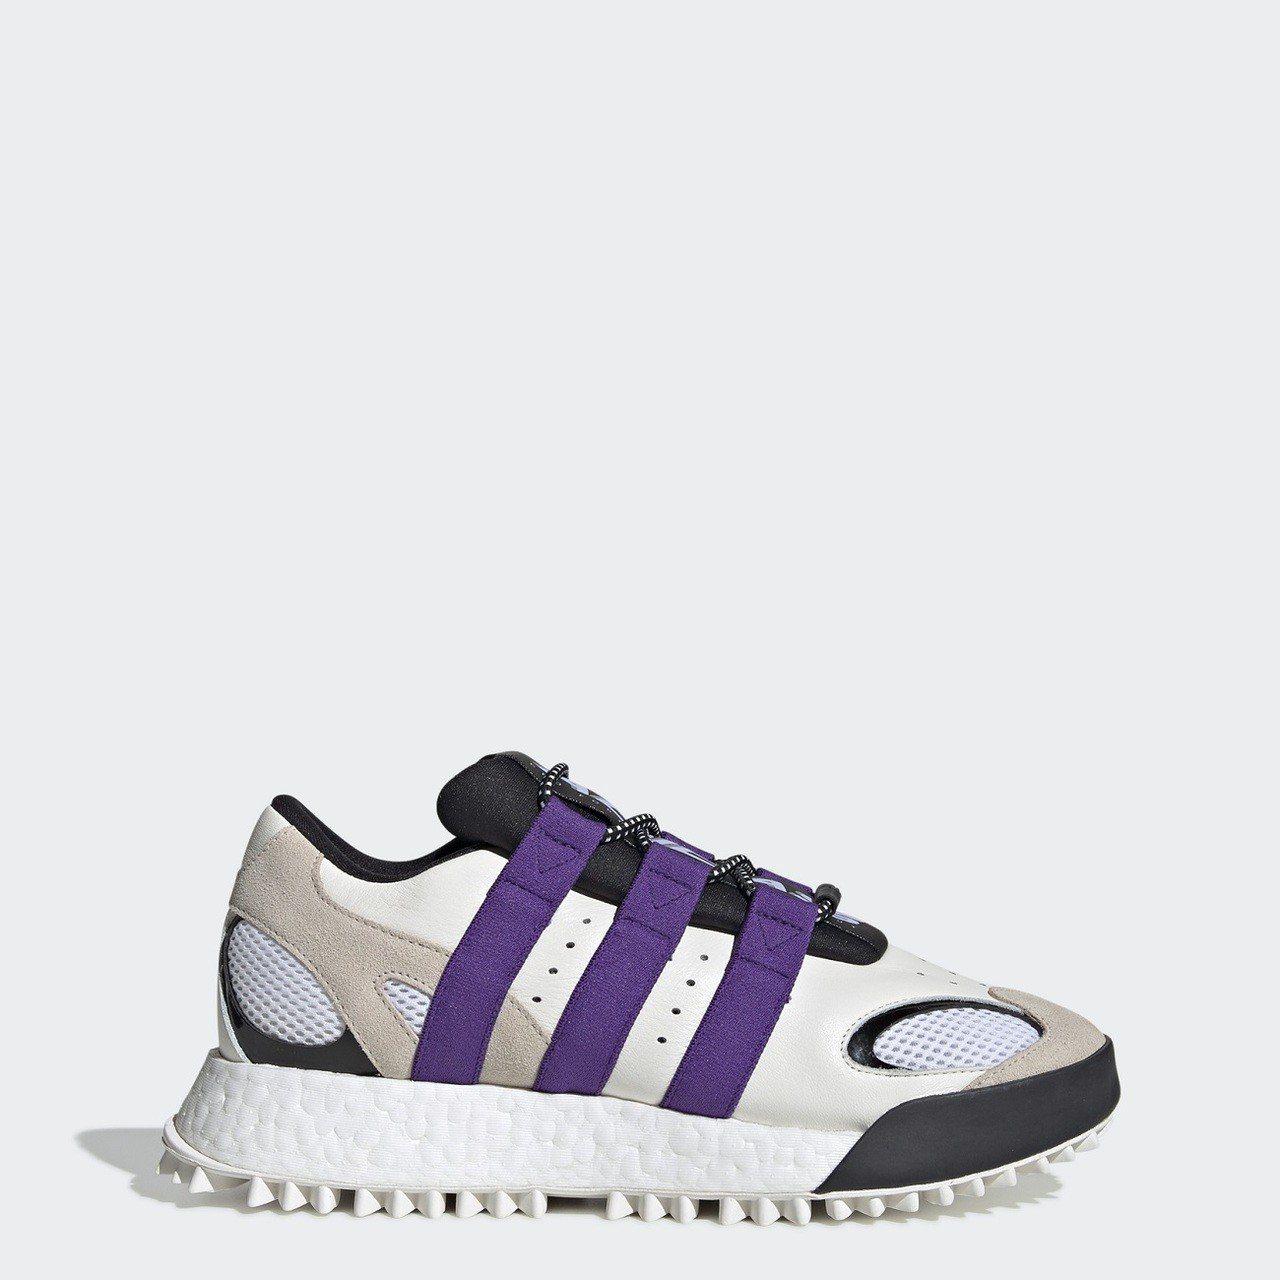 adidas Originals x alexander wang男女鞋款,售價...